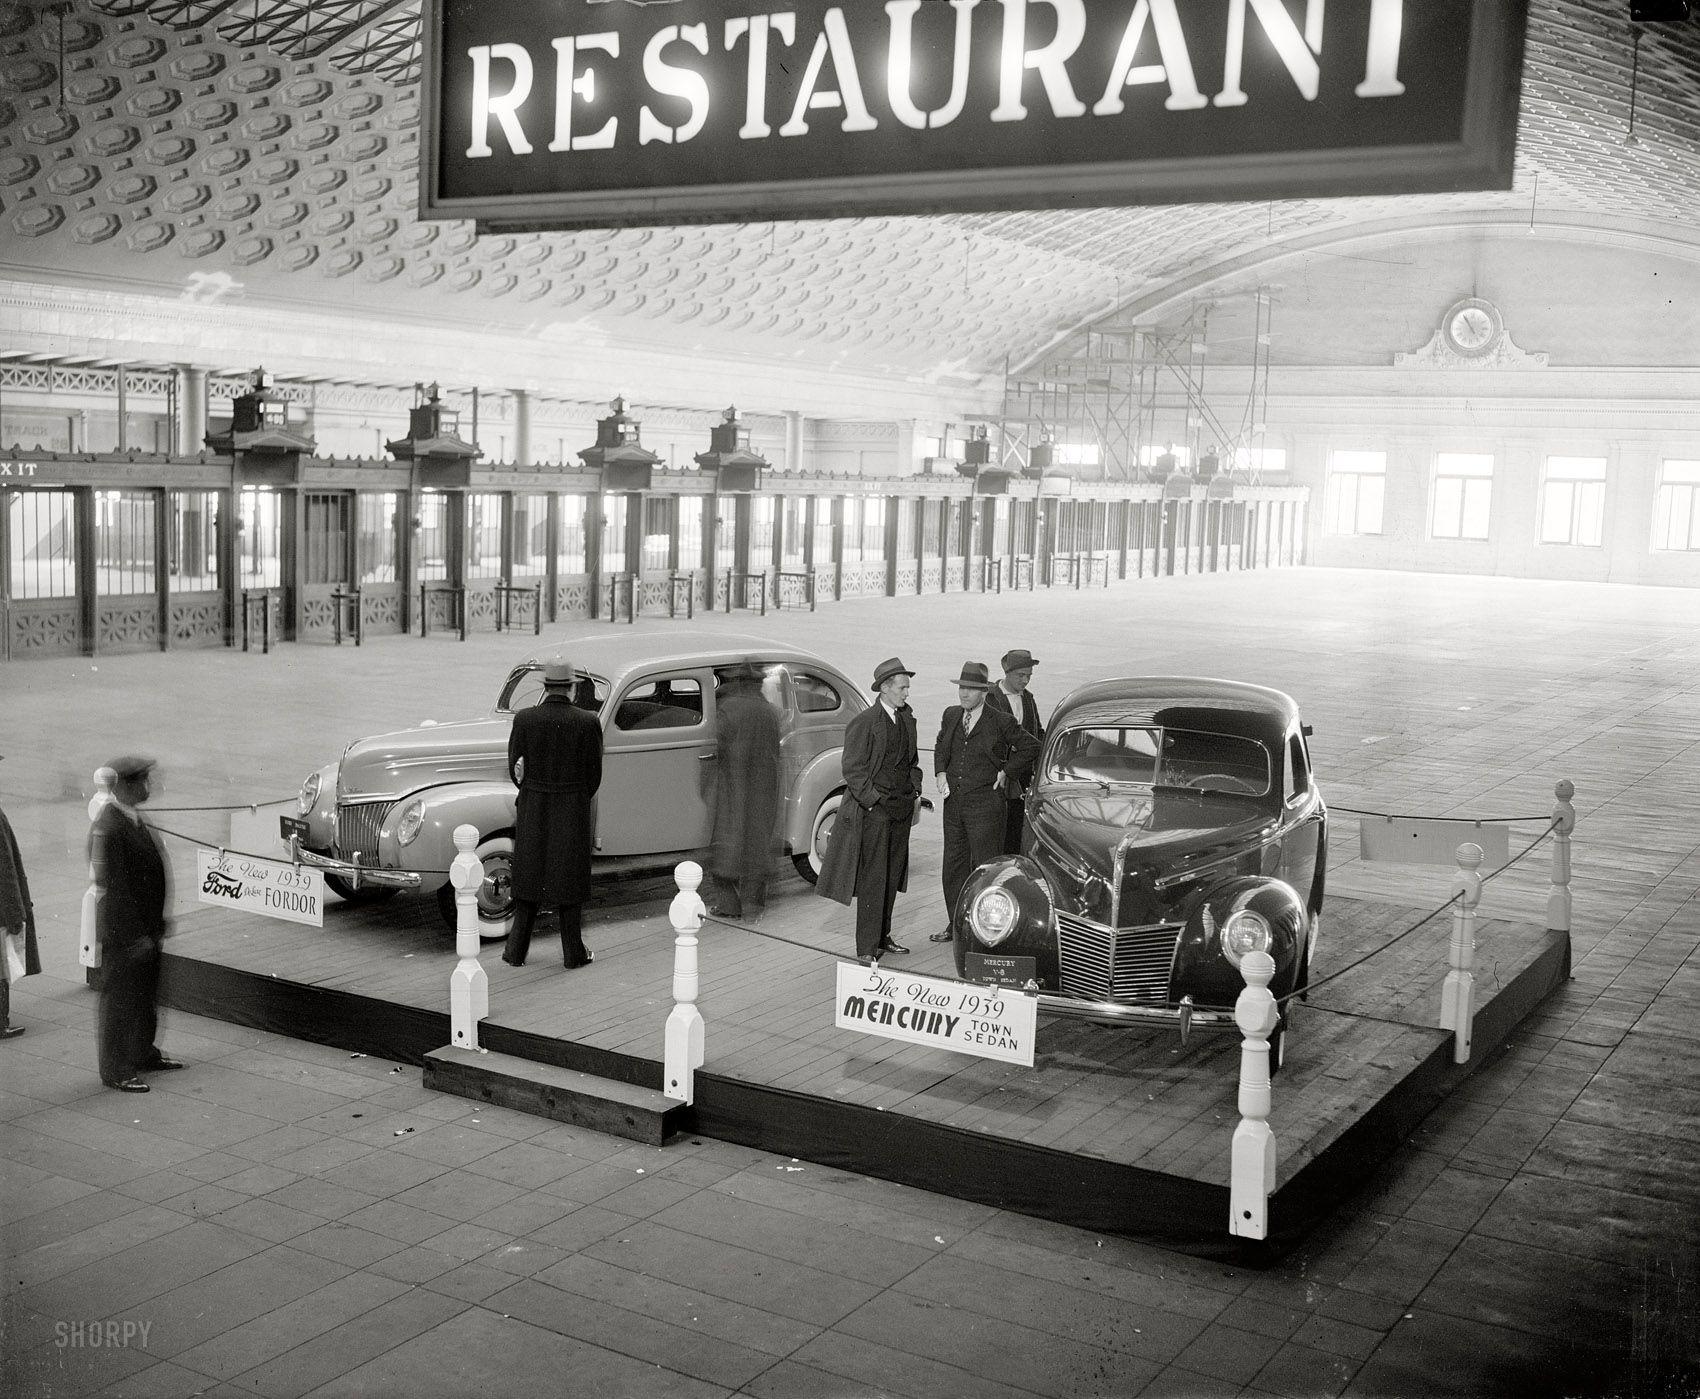 Ford Mercury 1939  (via Shorpy)